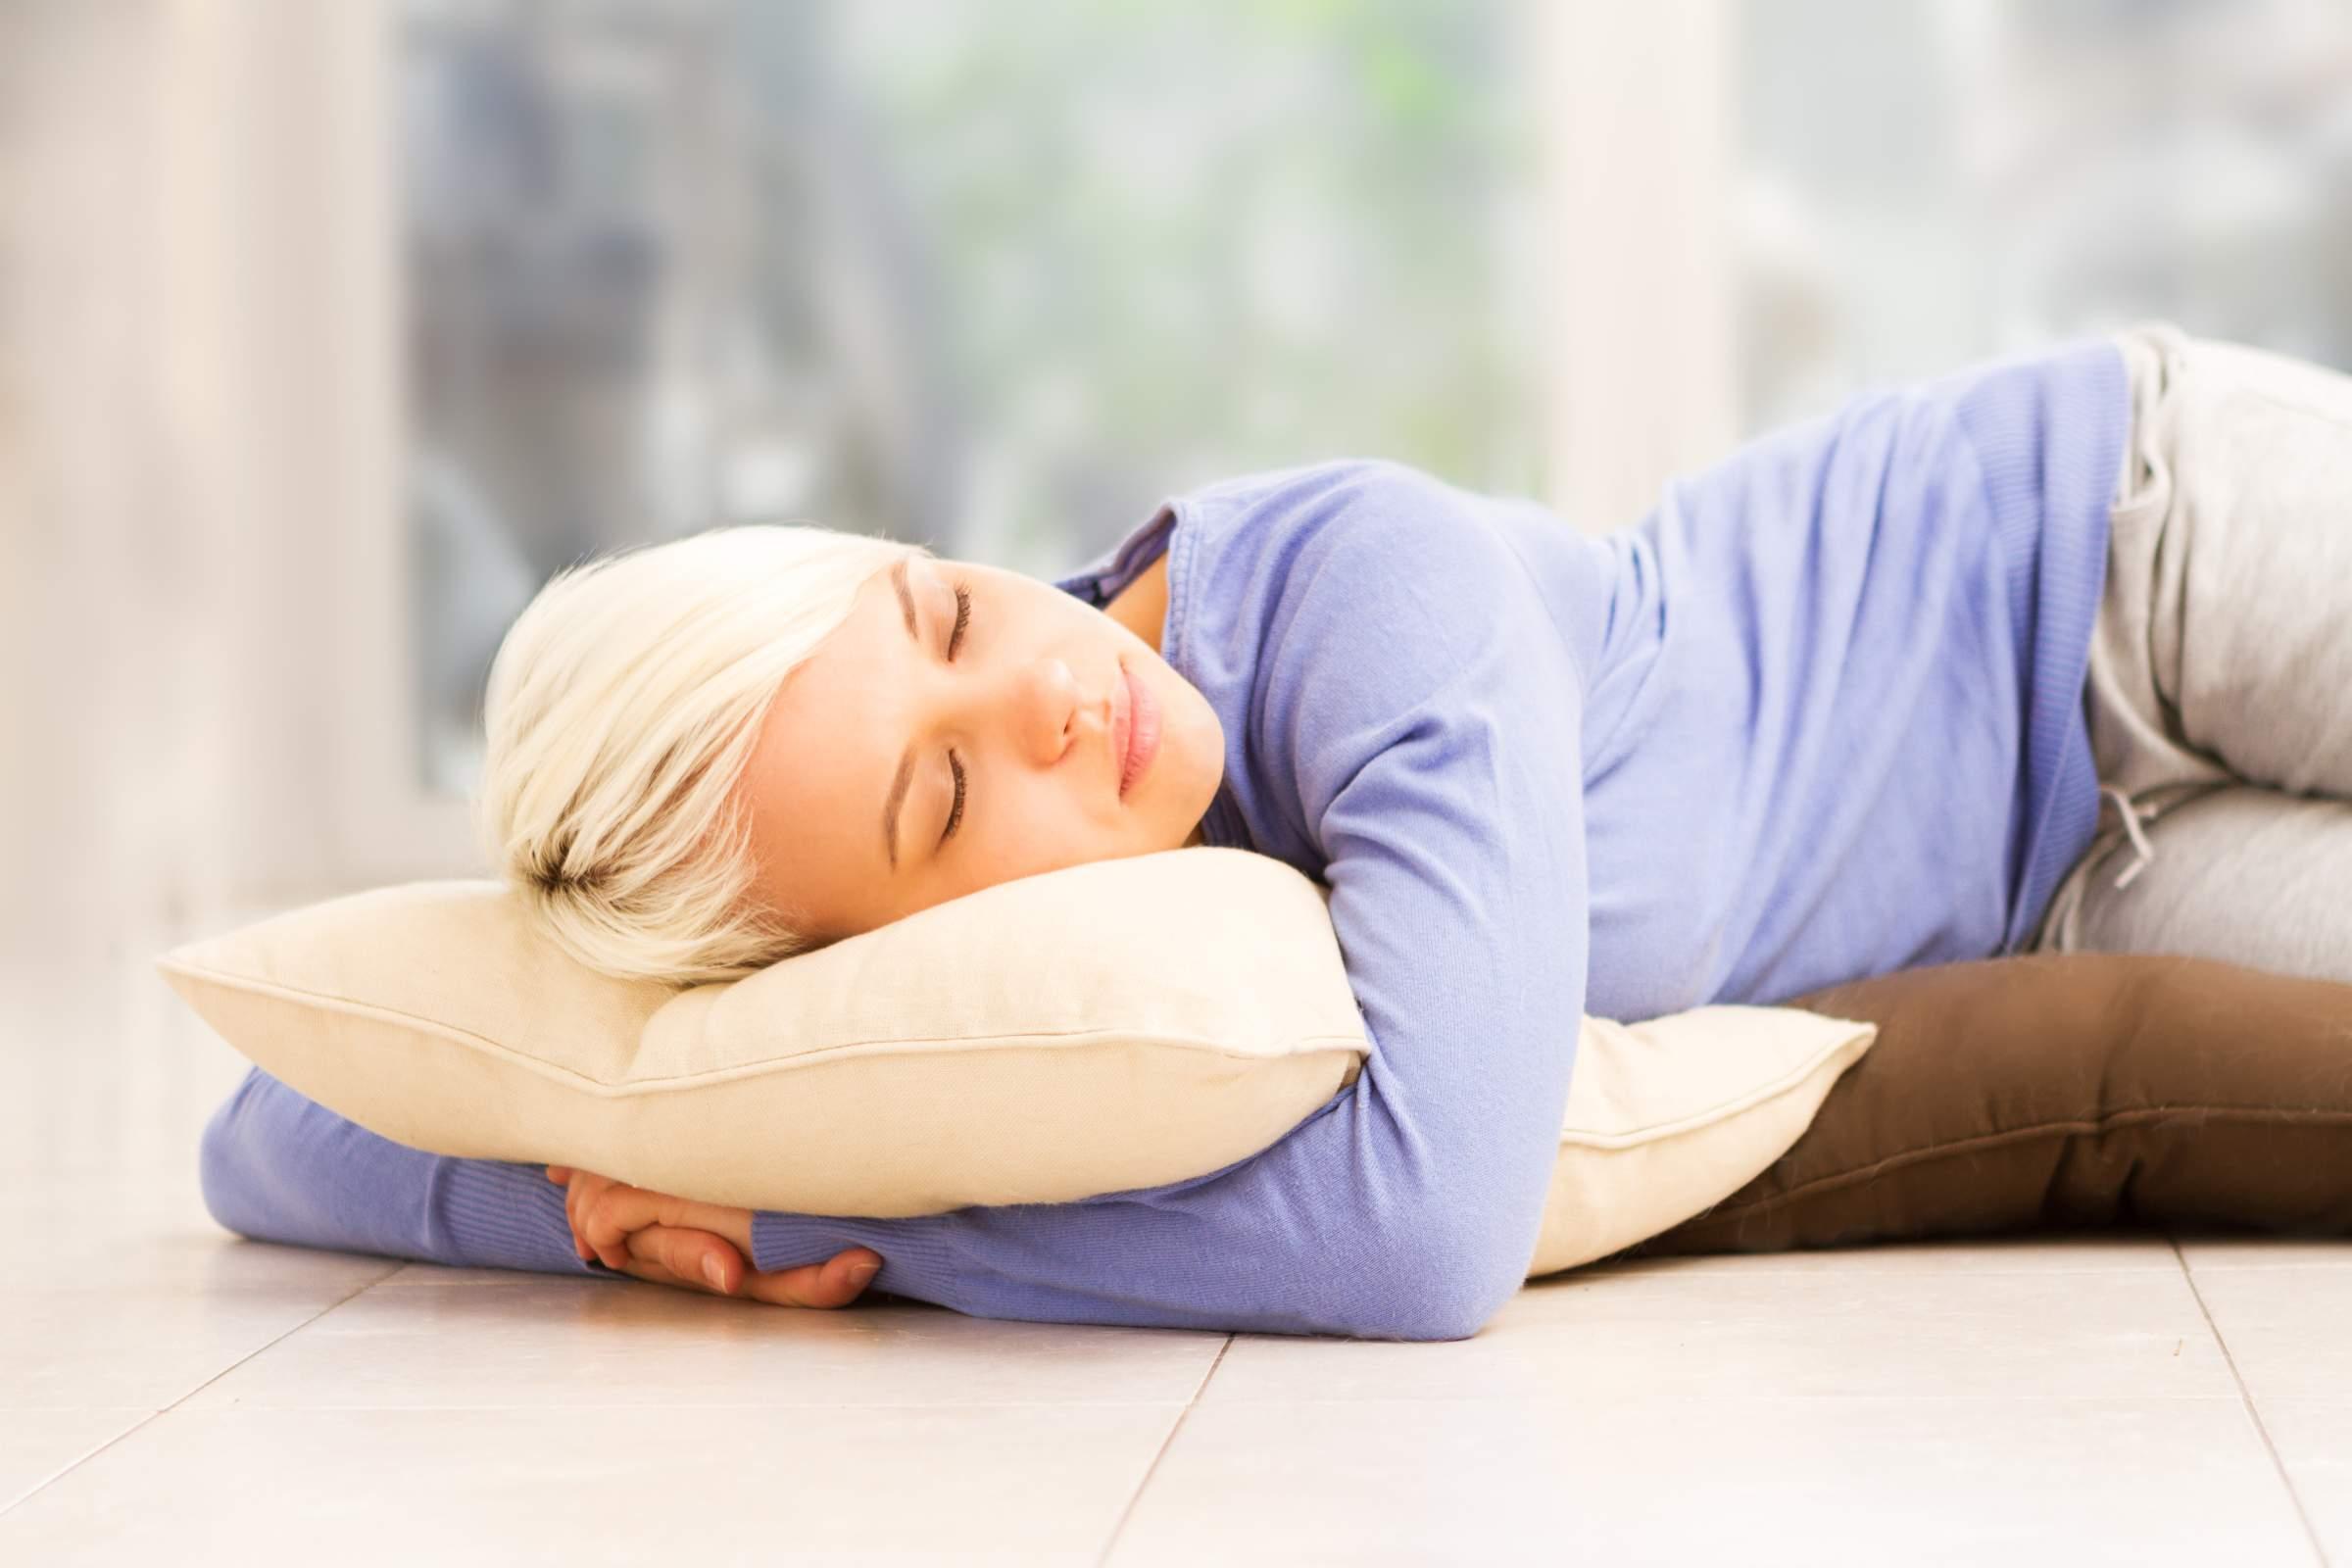 Should you sleep on the floor?